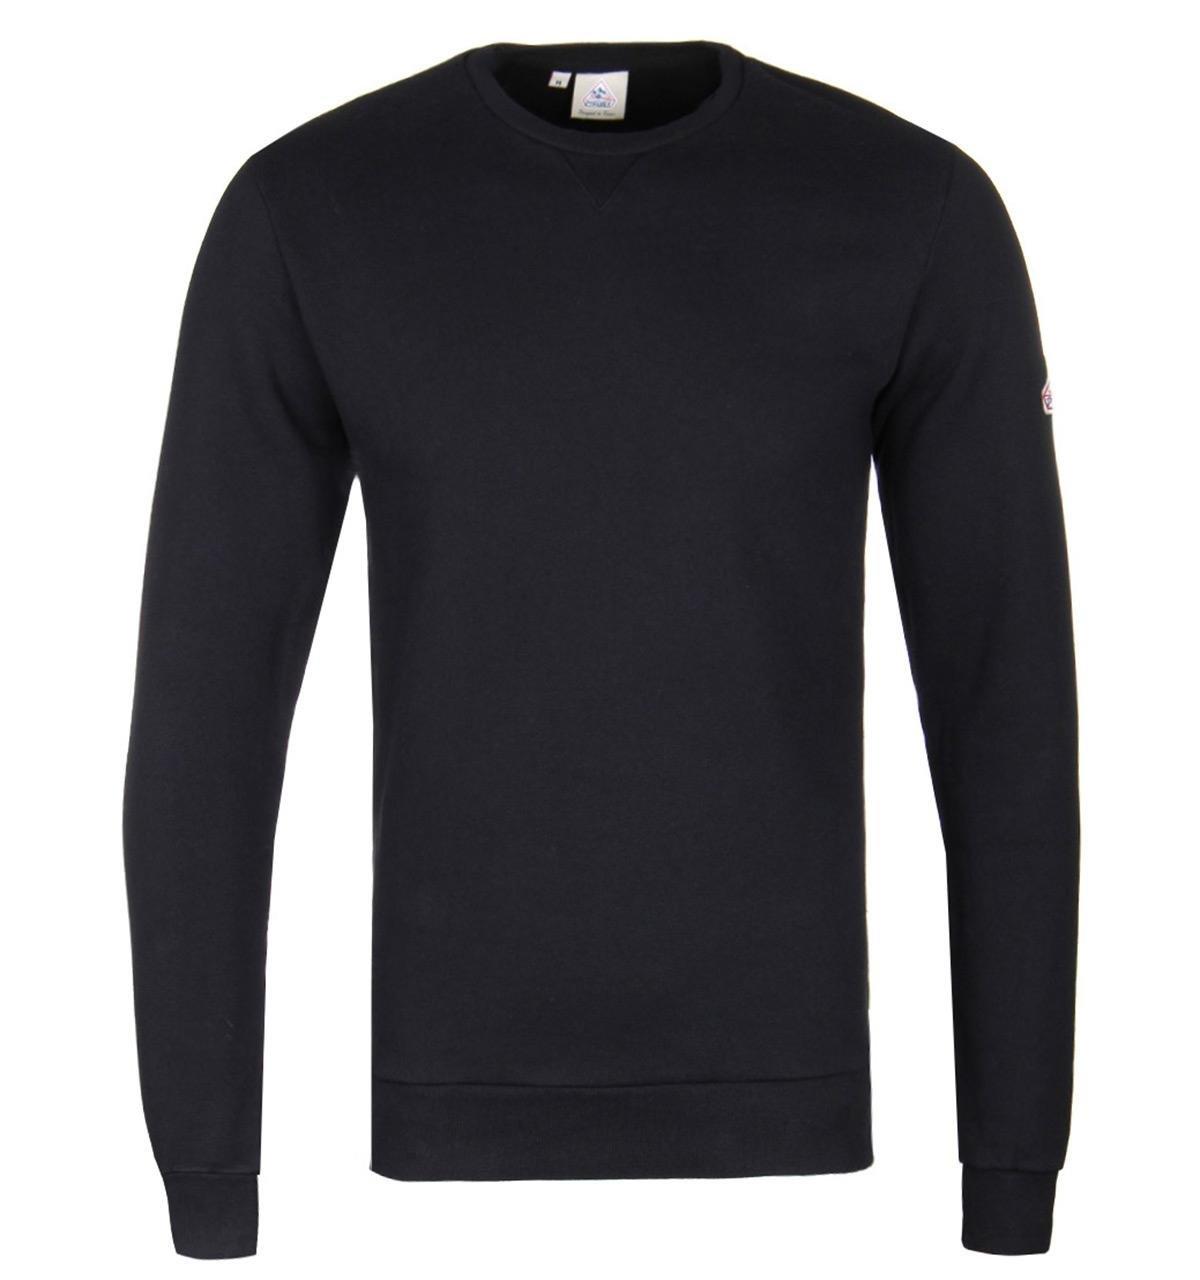 Pyrenex Cotton Black Chergui Sweatshirt for Men